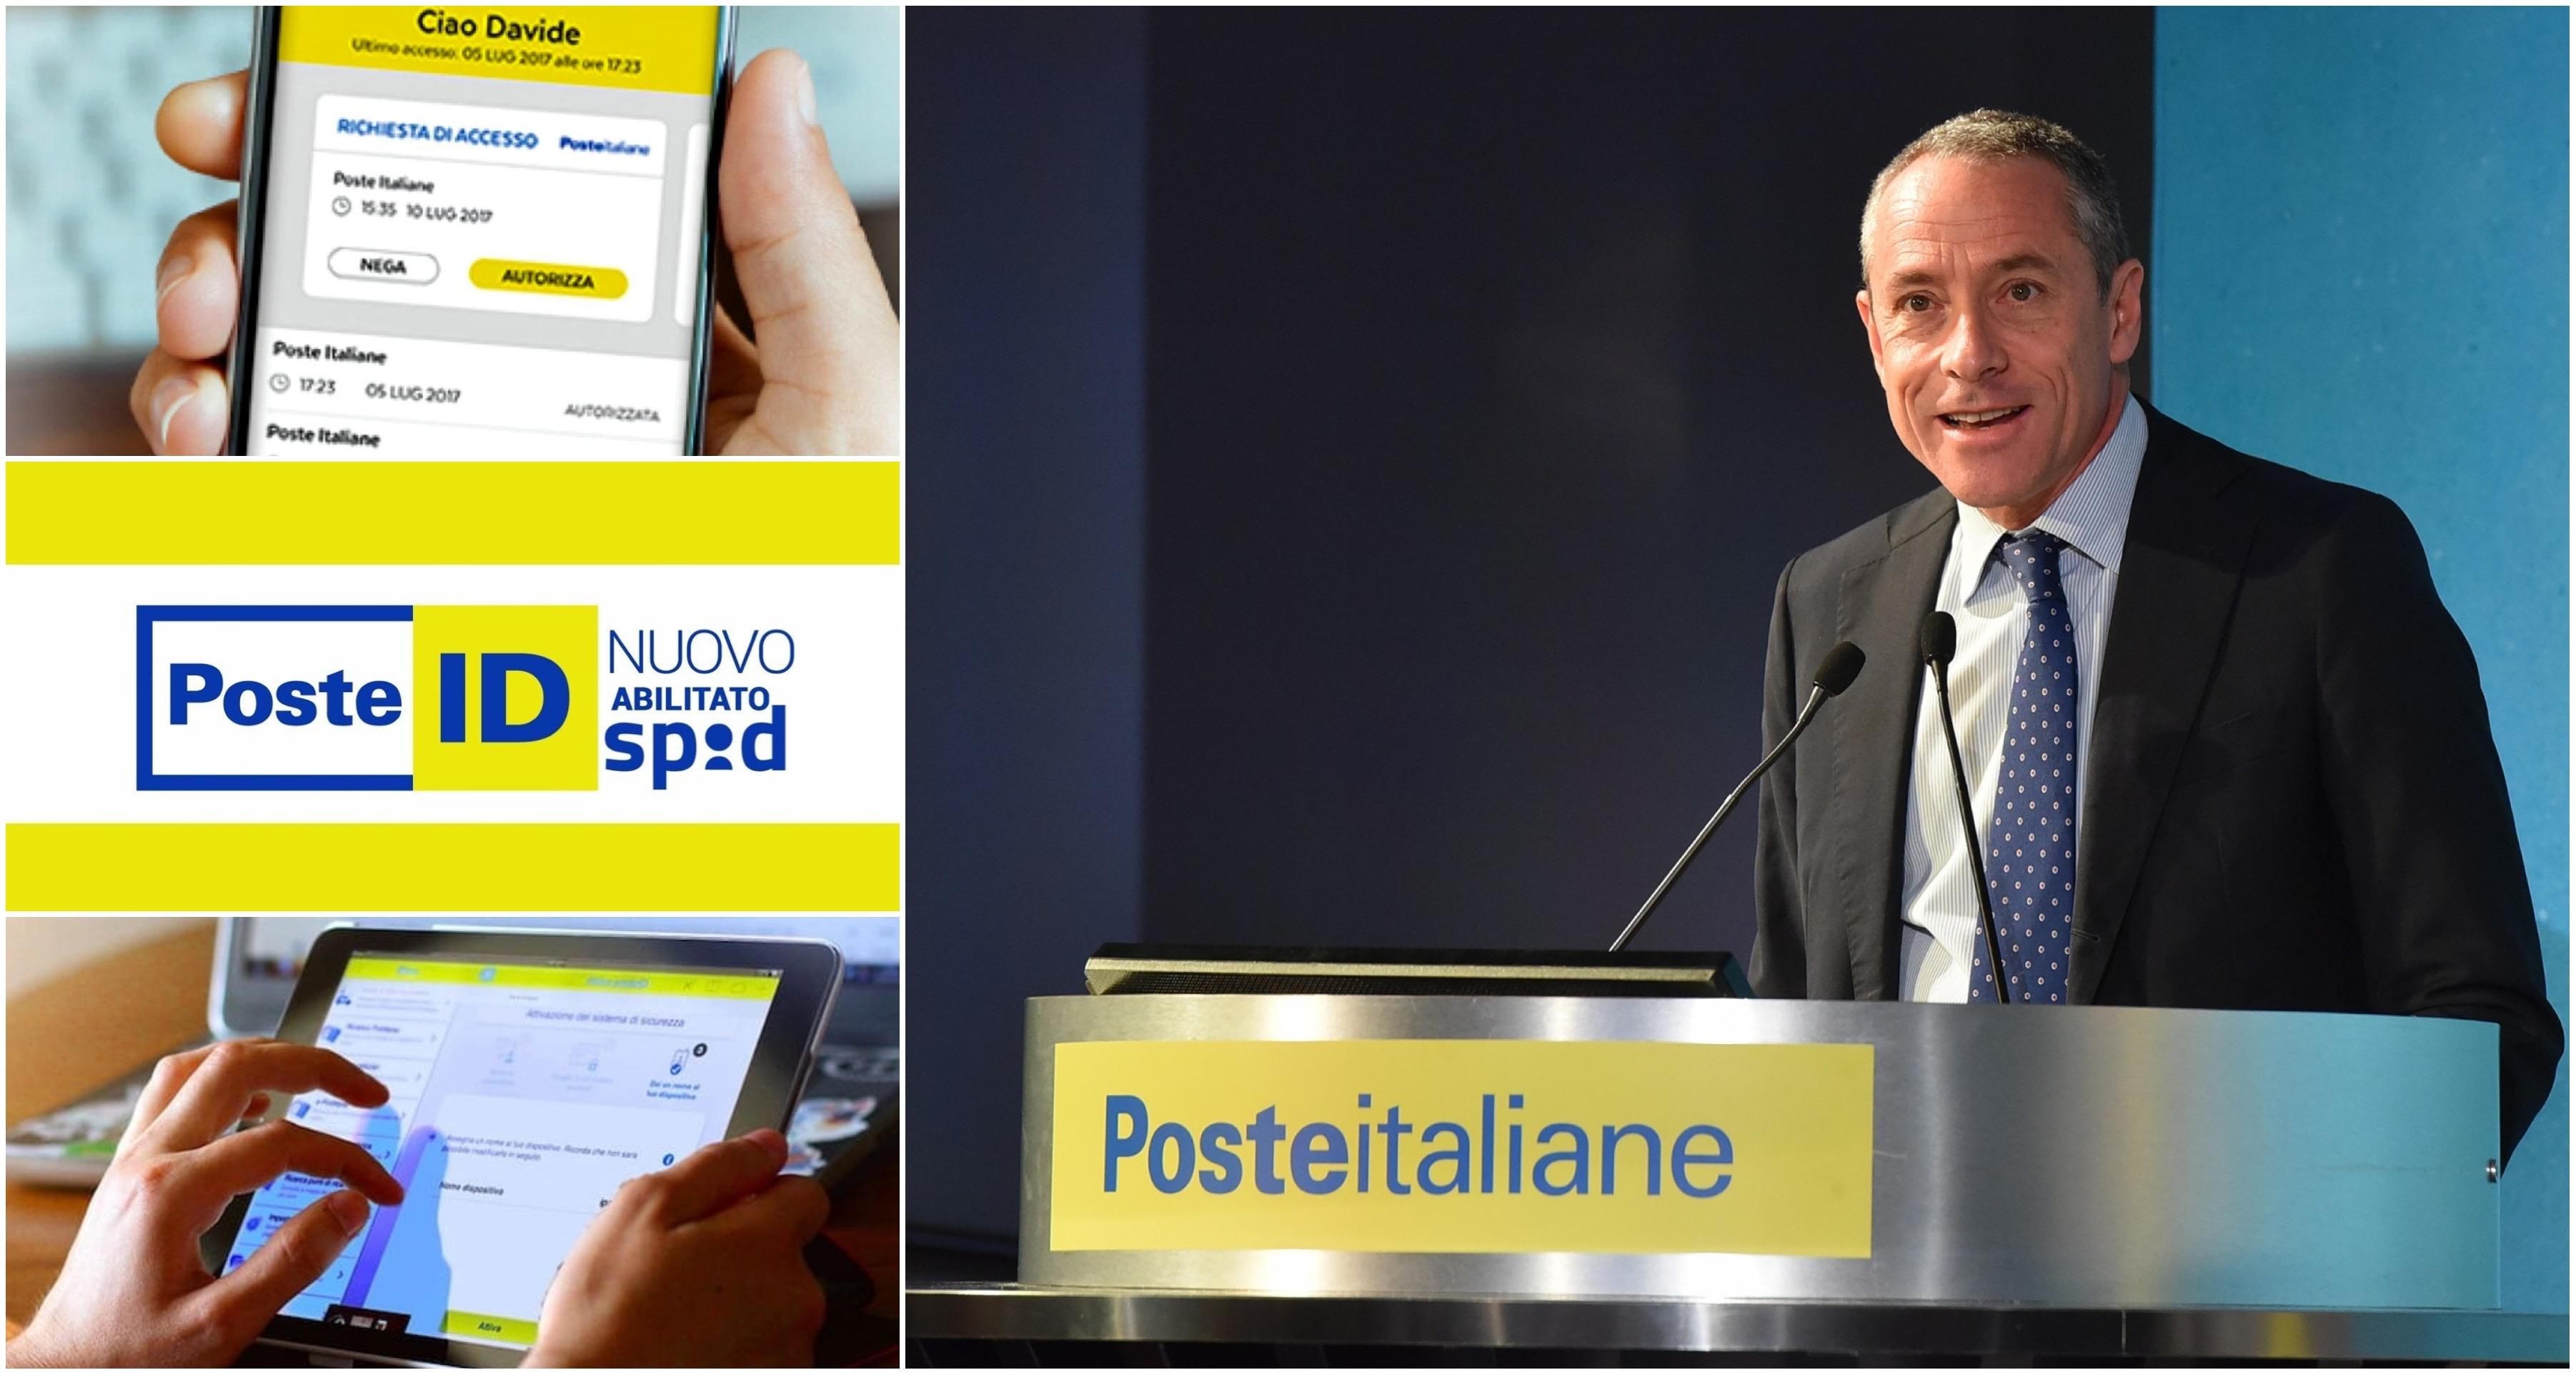 POSTE ITALIANE. UN SUCCESSO L'IDENTITÀ DIGITALI POSTE ID: GIÀ RILASCIATE A VERONA 215 MILA, 15 MILIONI IN ITALIA.